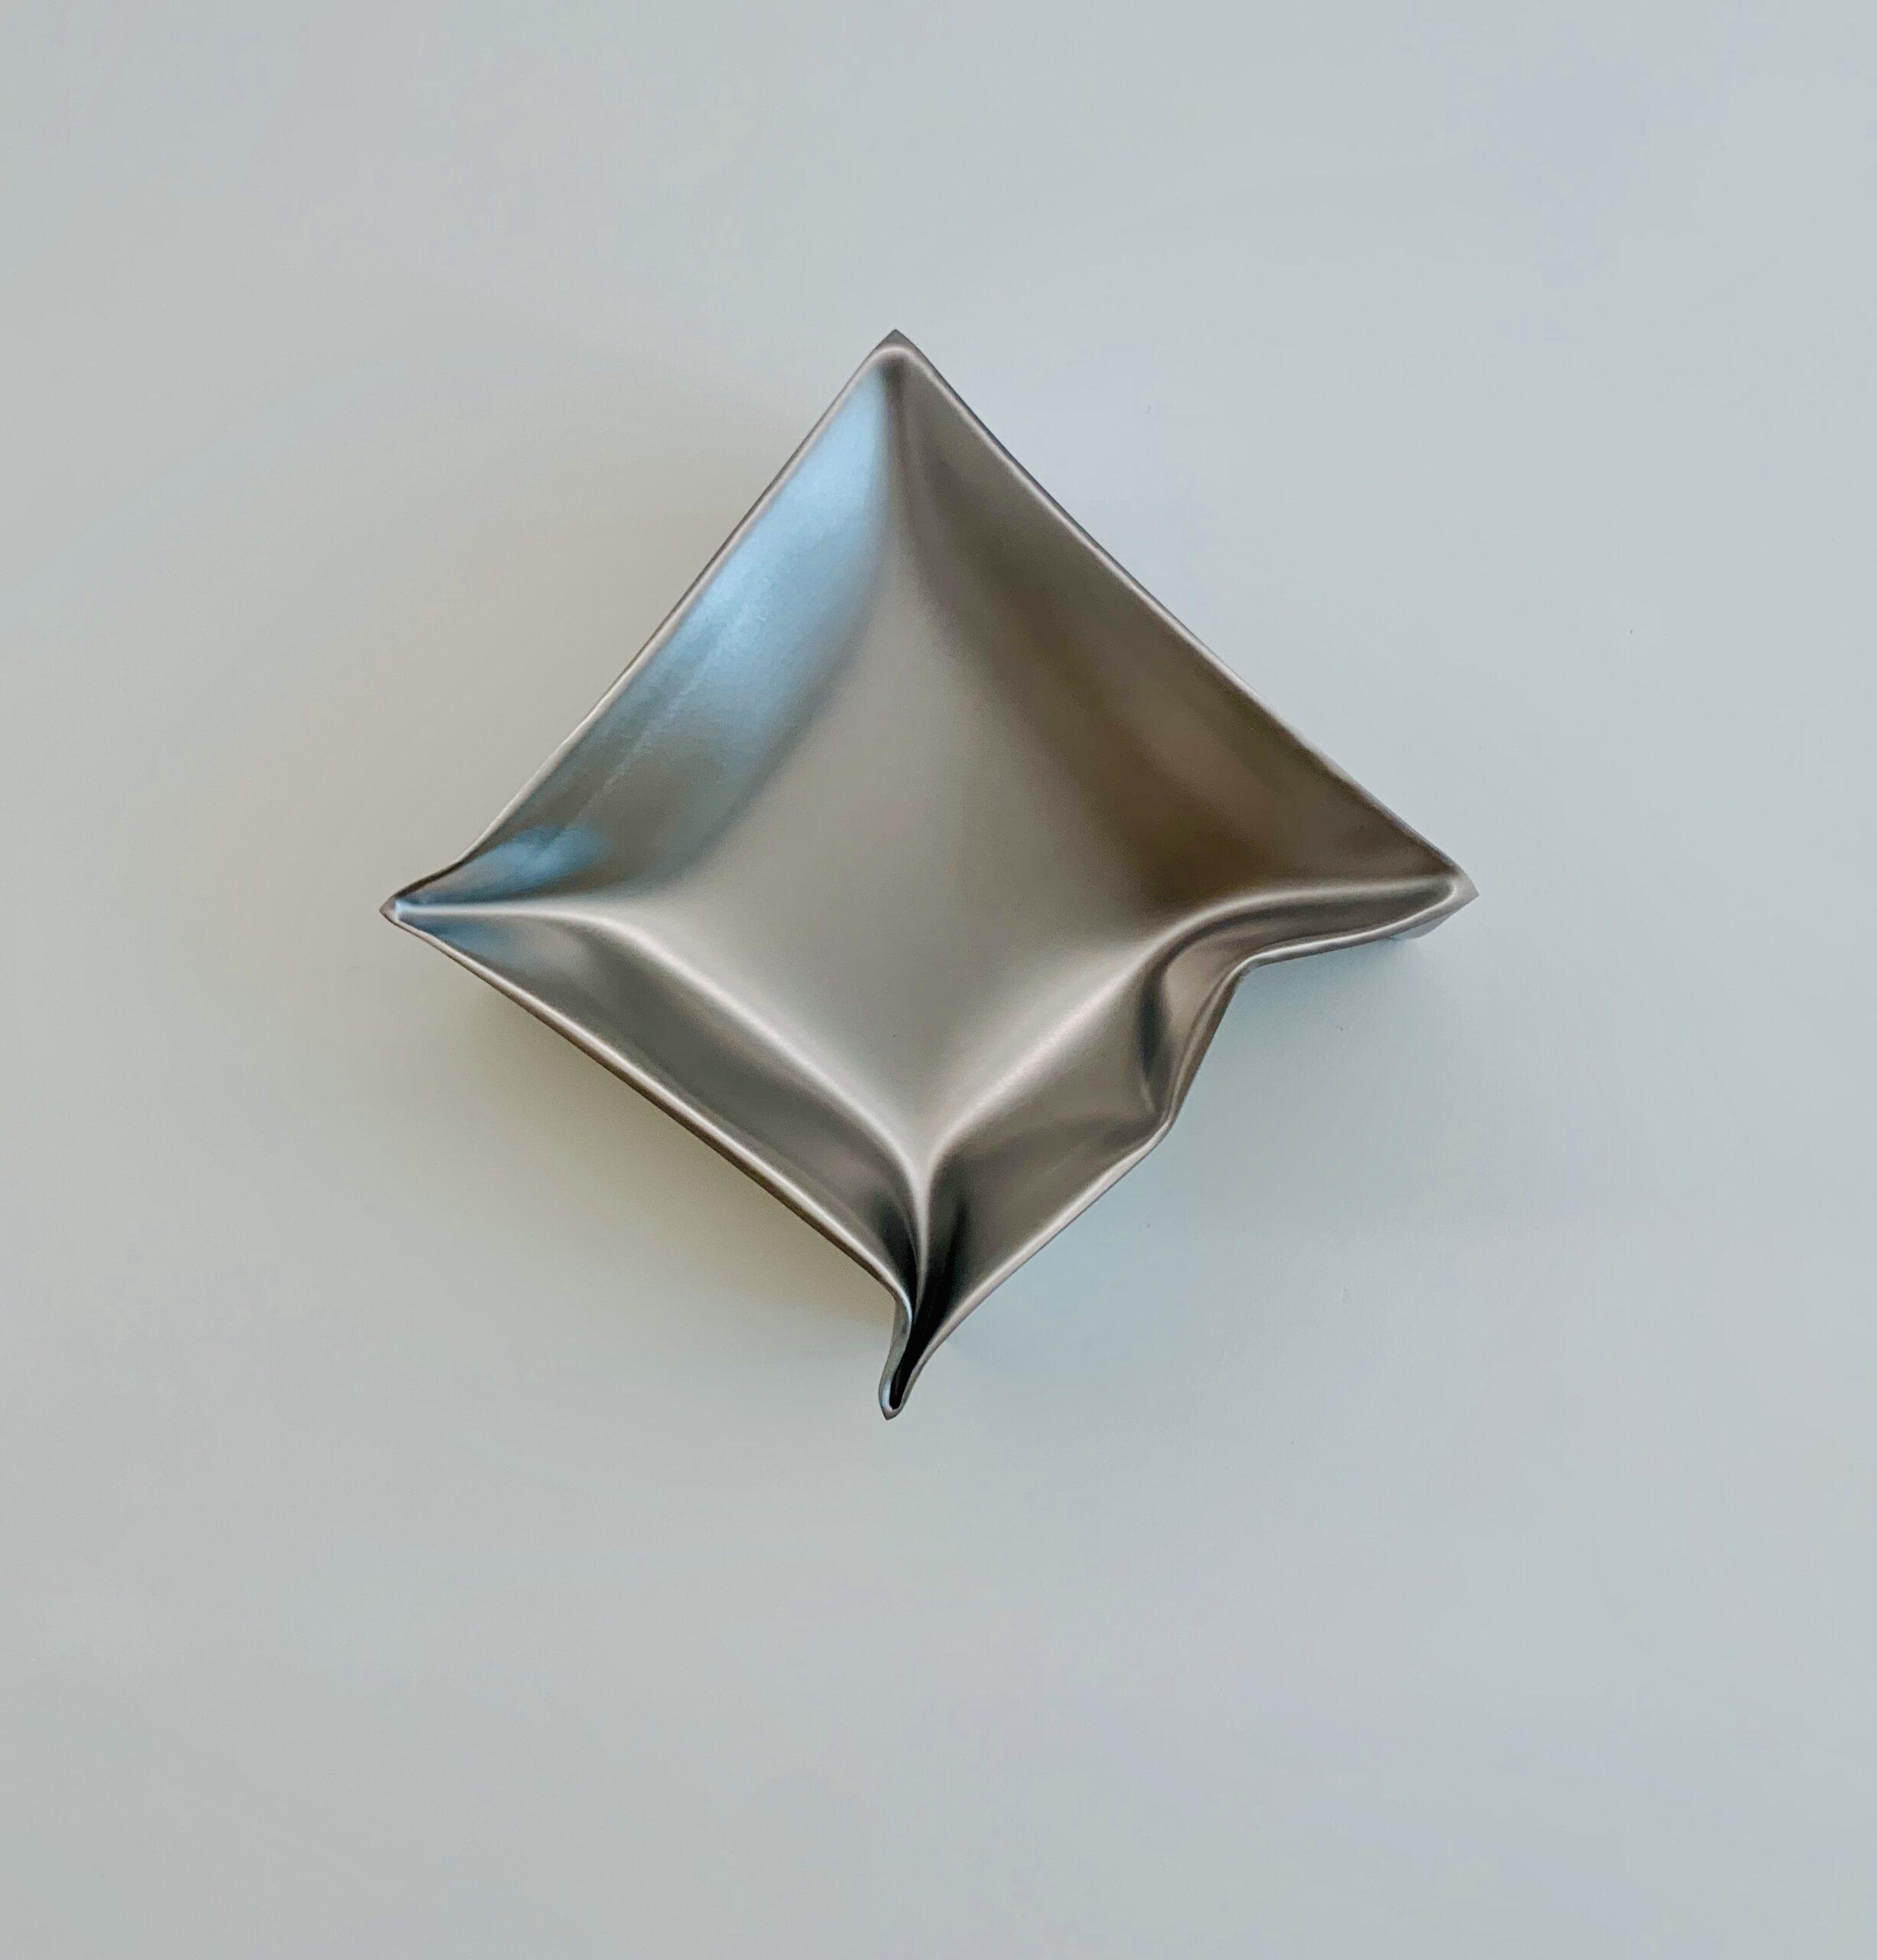 Ewerdt Hilgemann, Half Cube (Flying Object), 2020